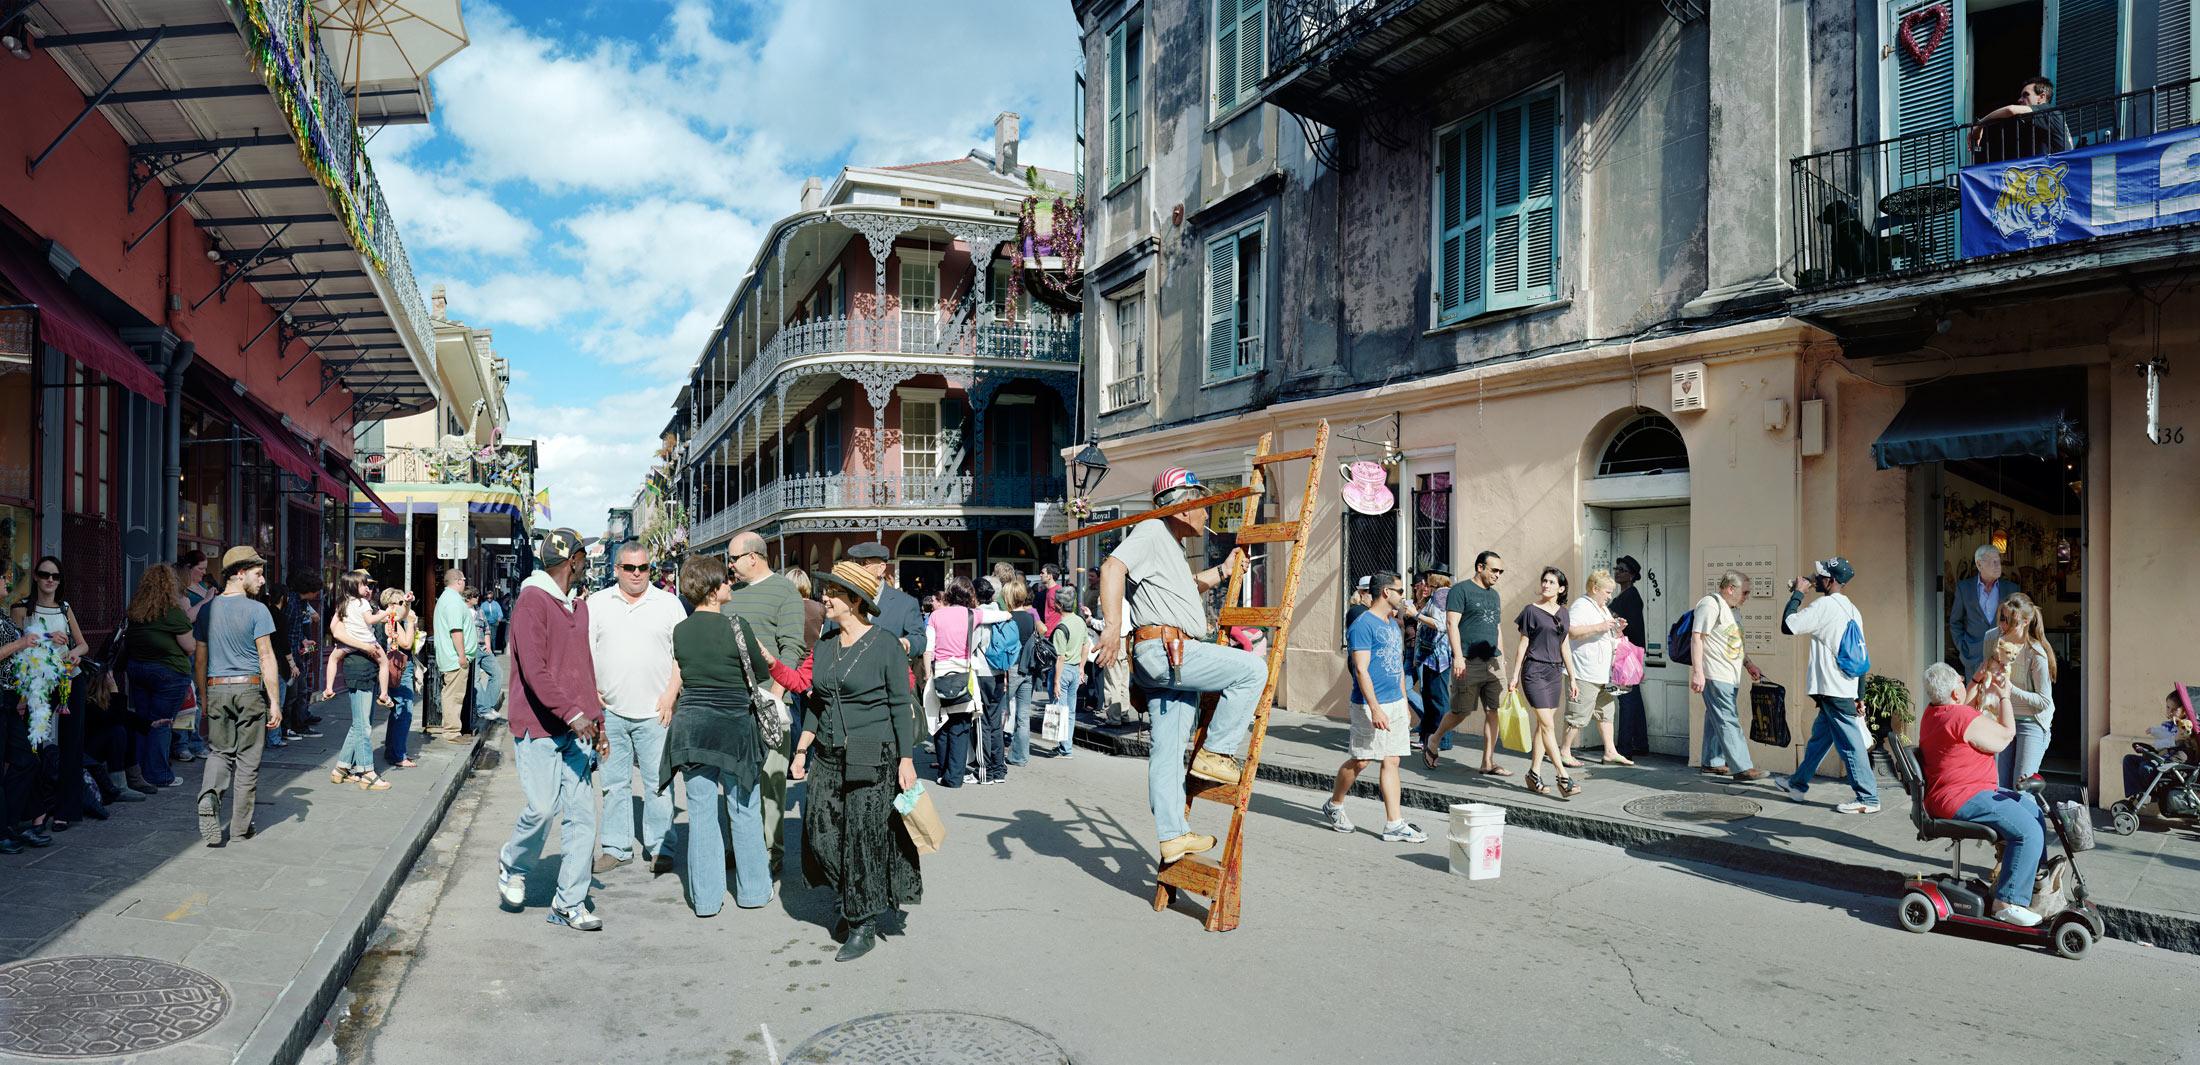 Man on Ladder, Royal Street, New Orleans.